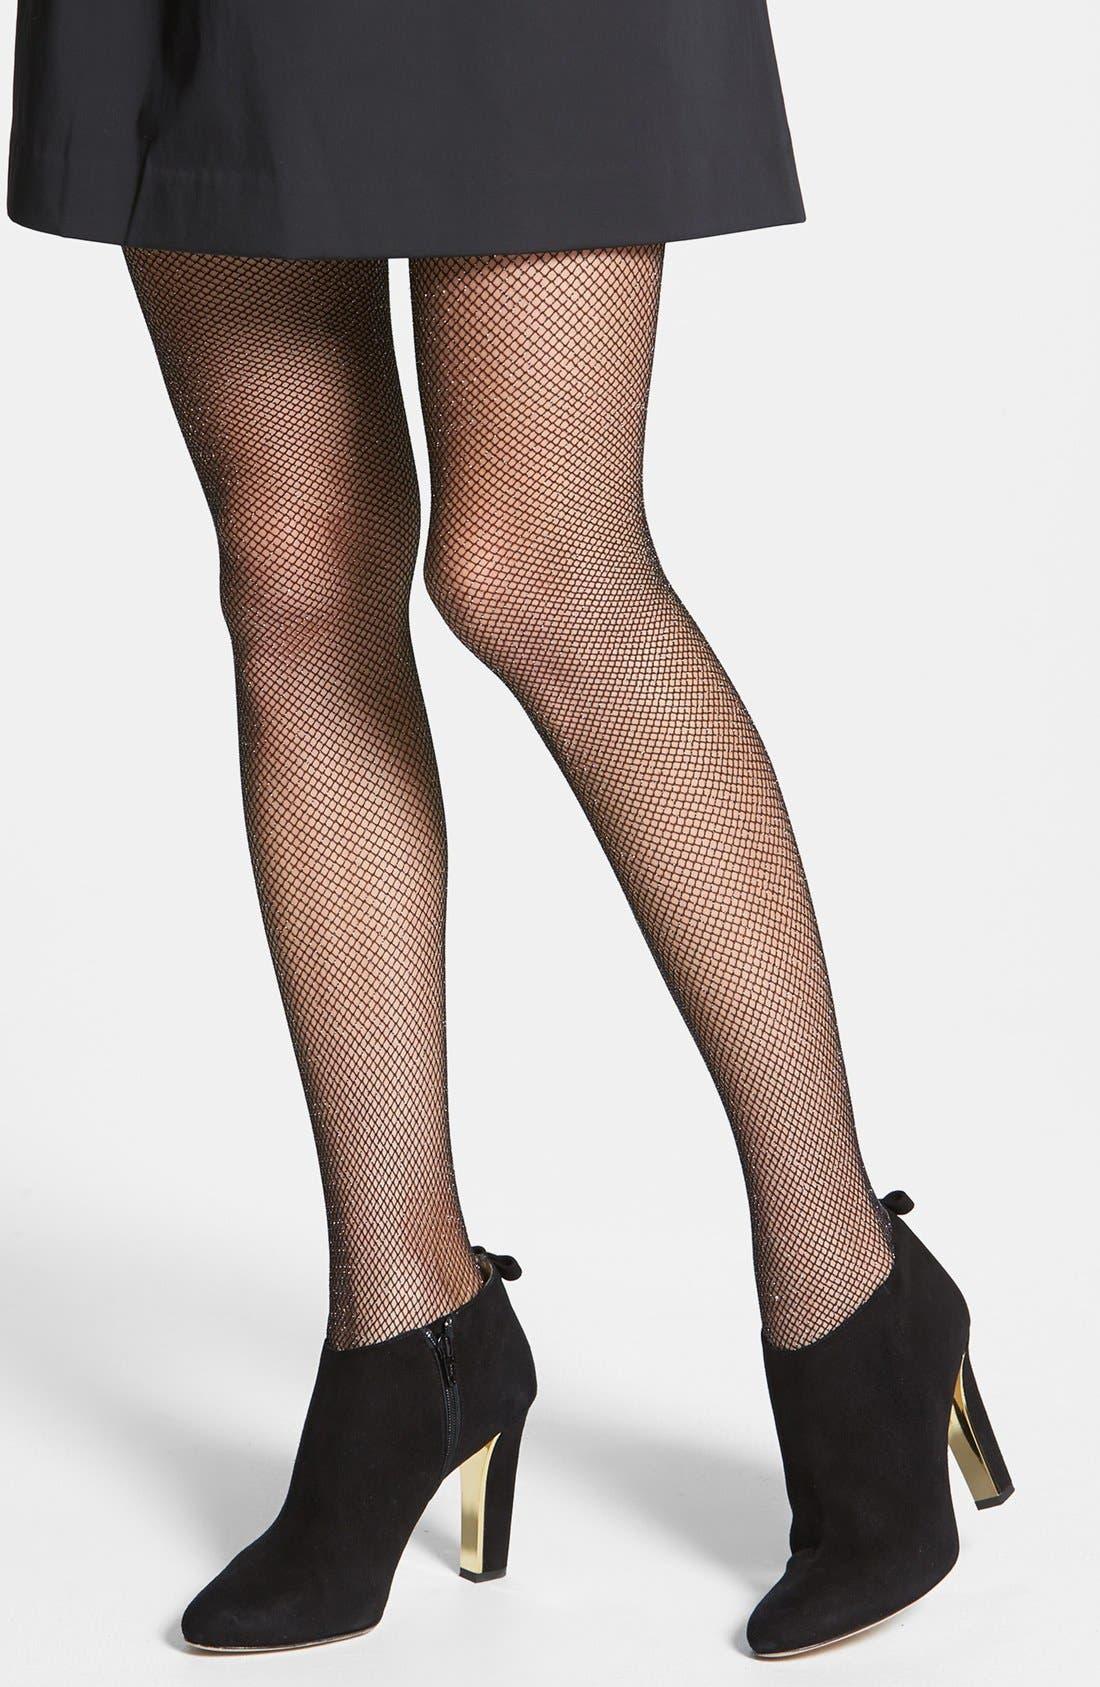 Main Image - kate spade new york 'sparkle' fishnet stockings